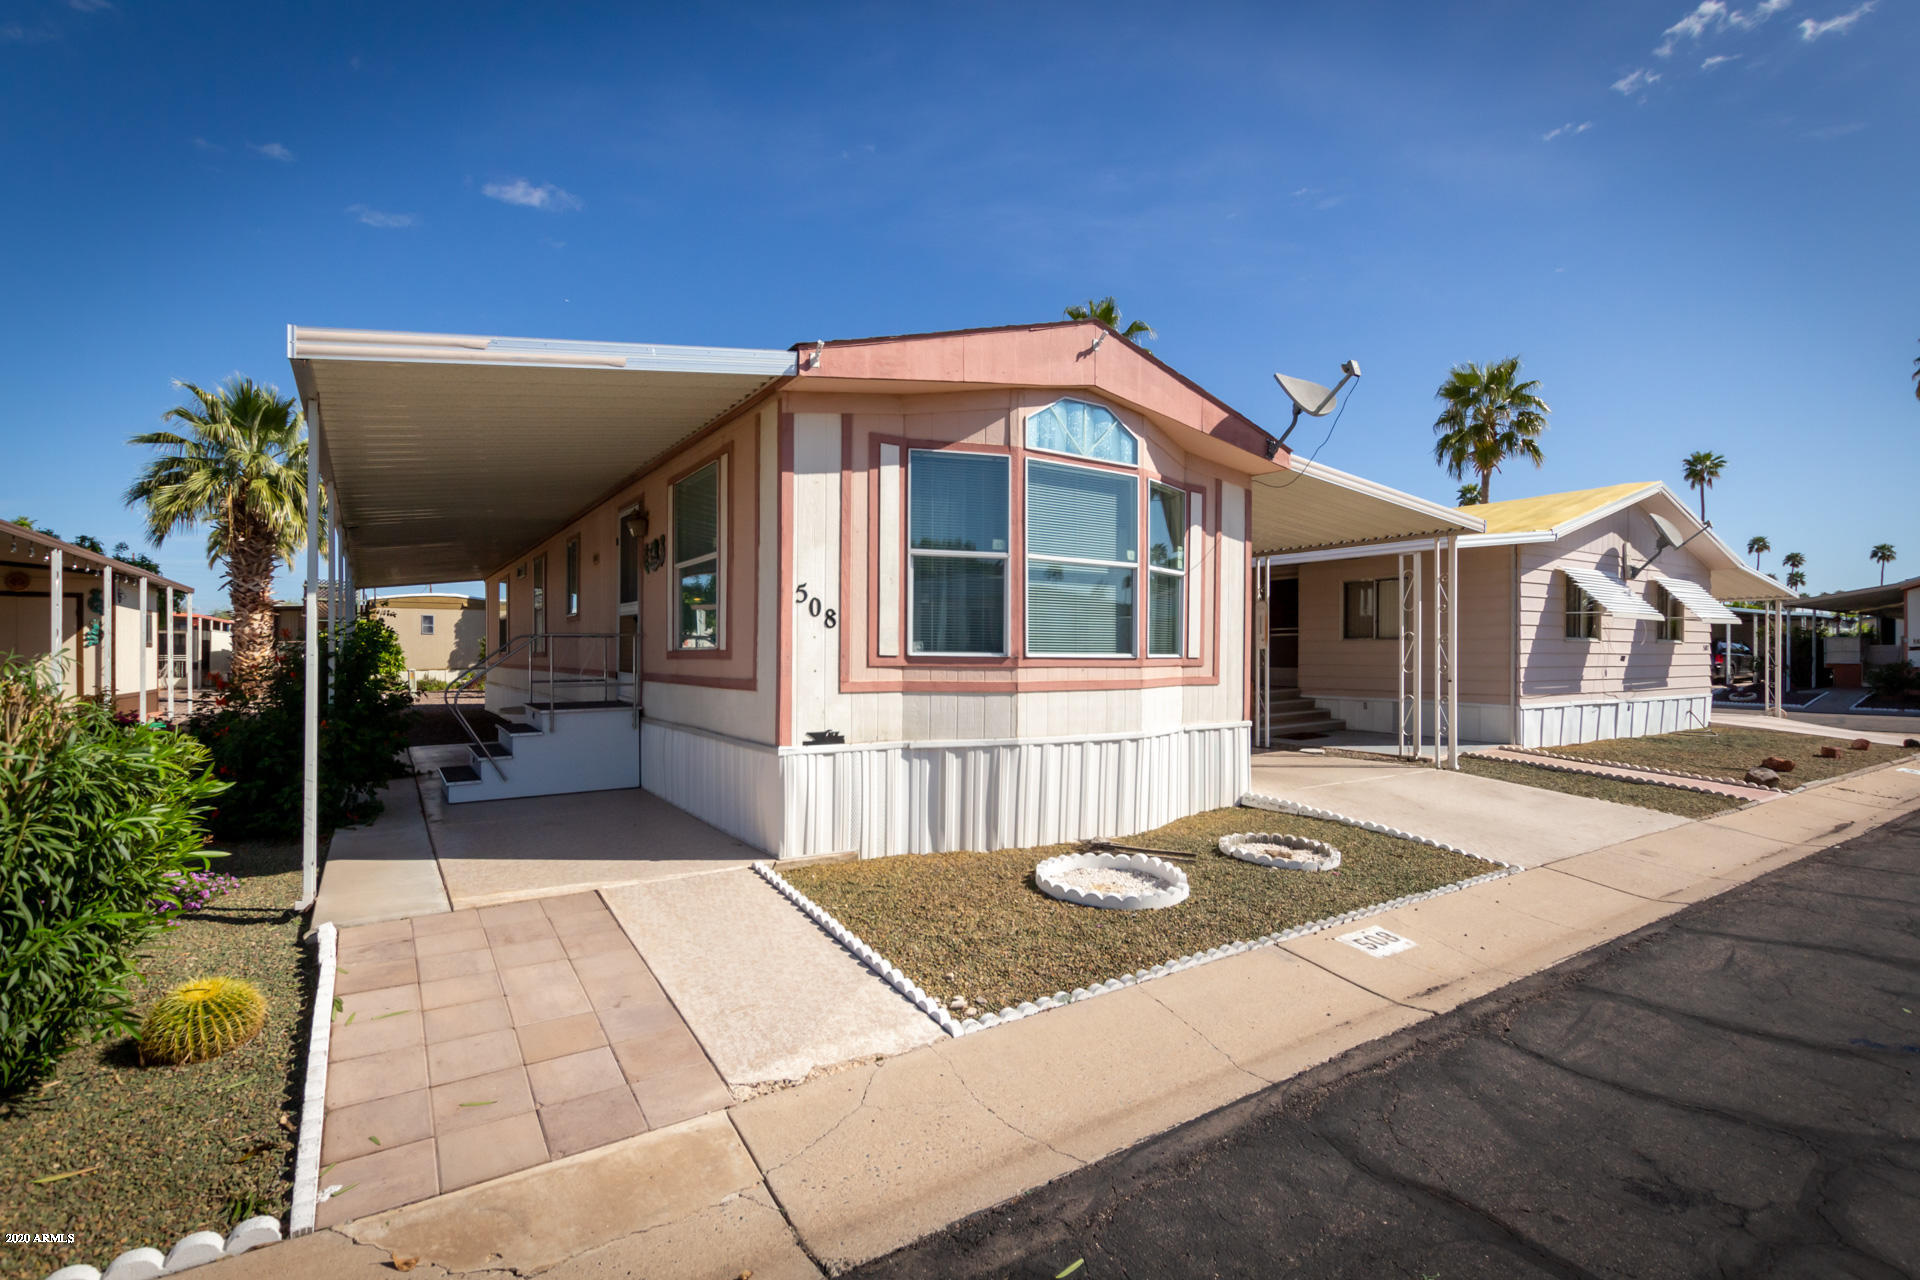 Photo of 4065 E UNIVERSITY #508 Drive, Mesa, AZ 85205